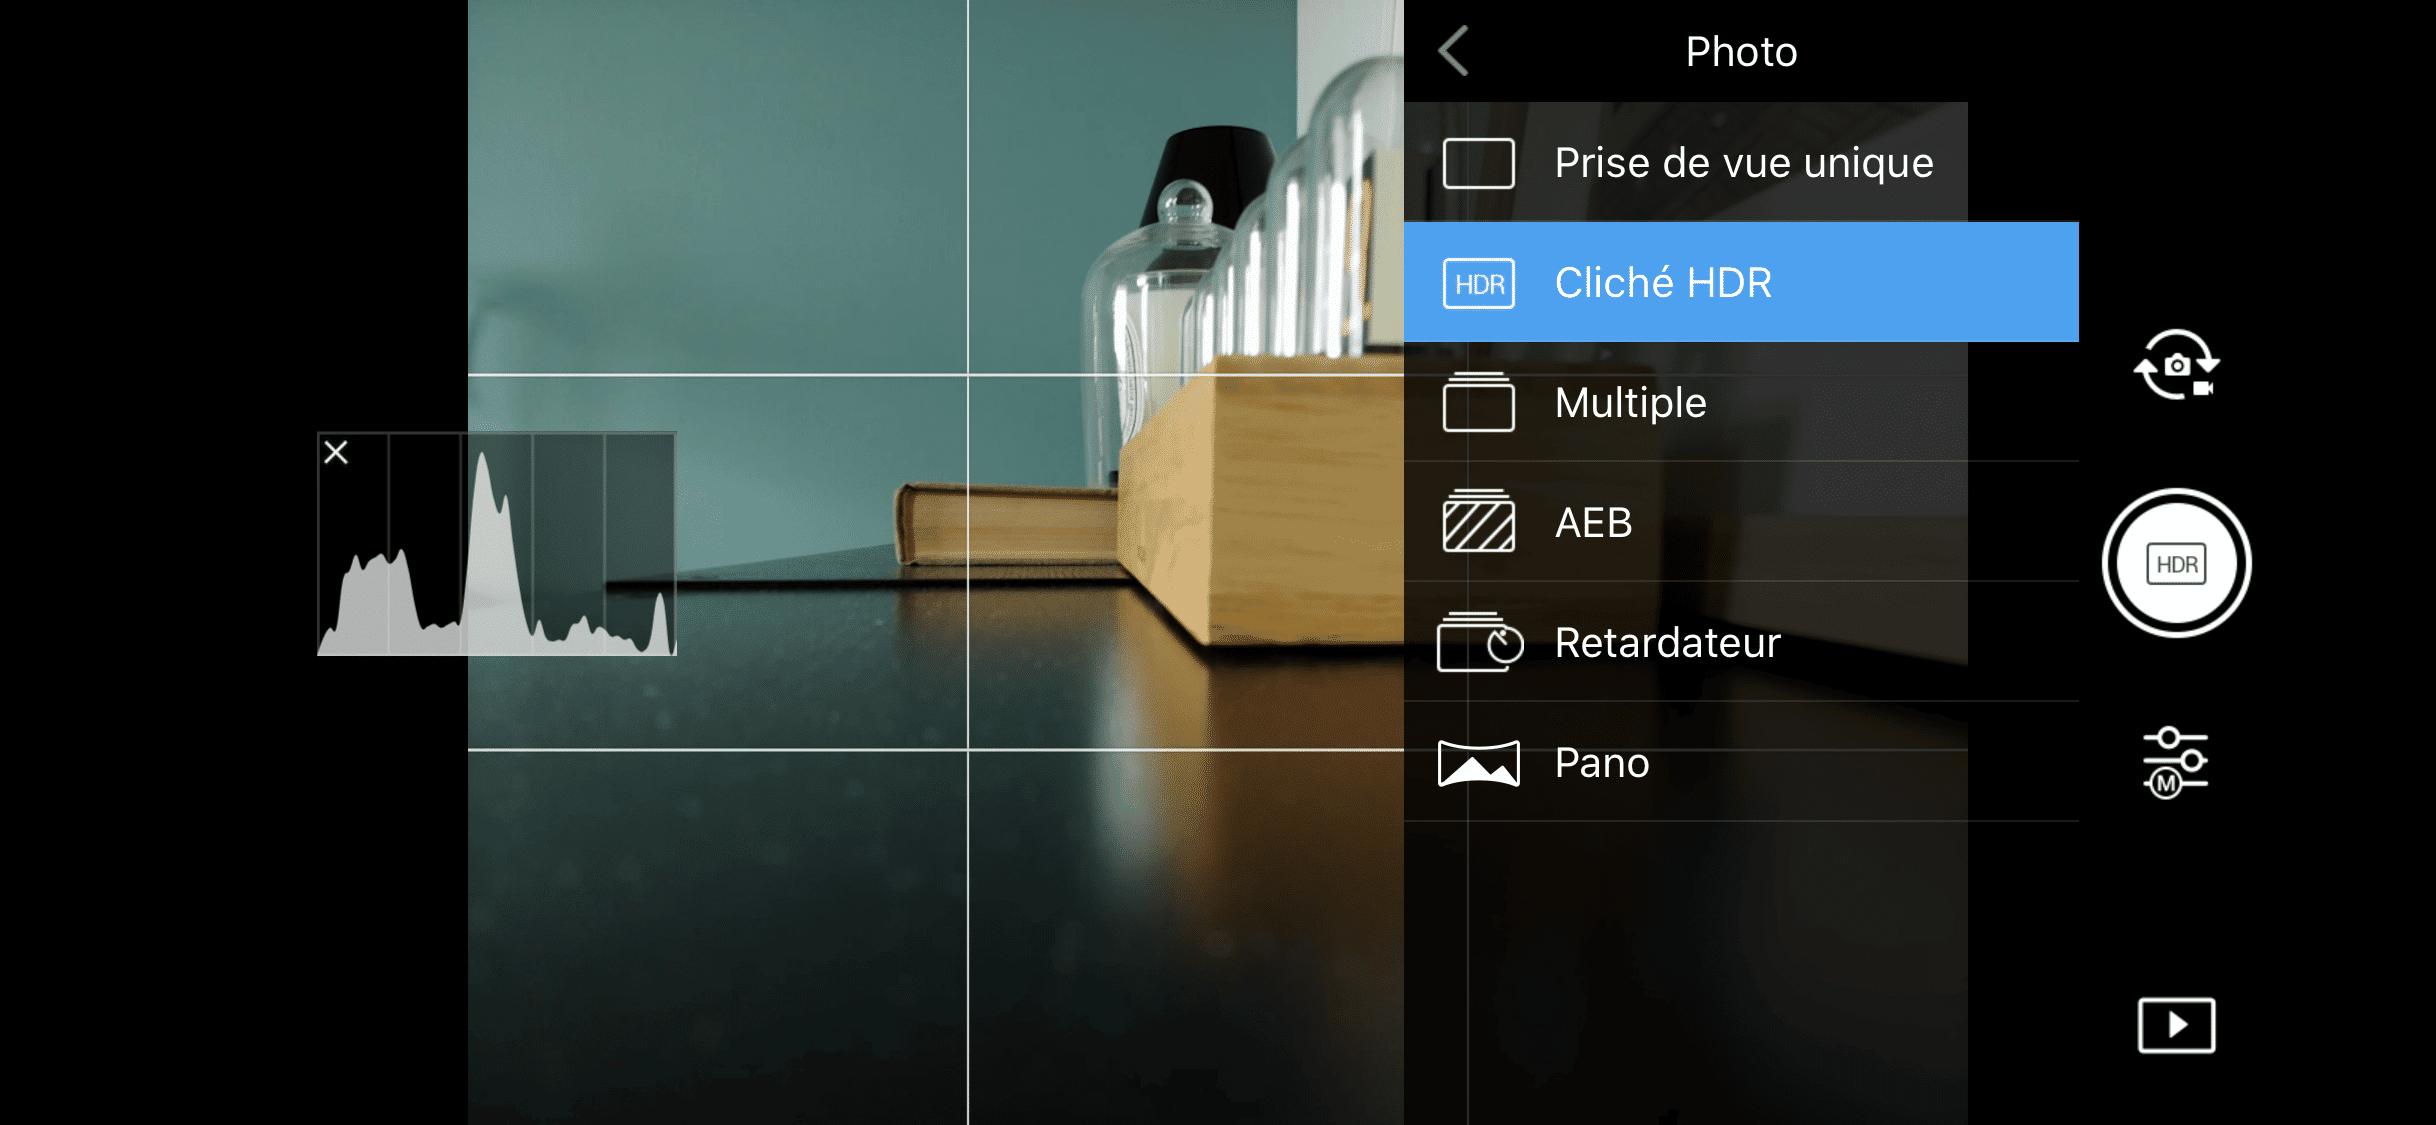 DJI Mavic Air - Mode HDR